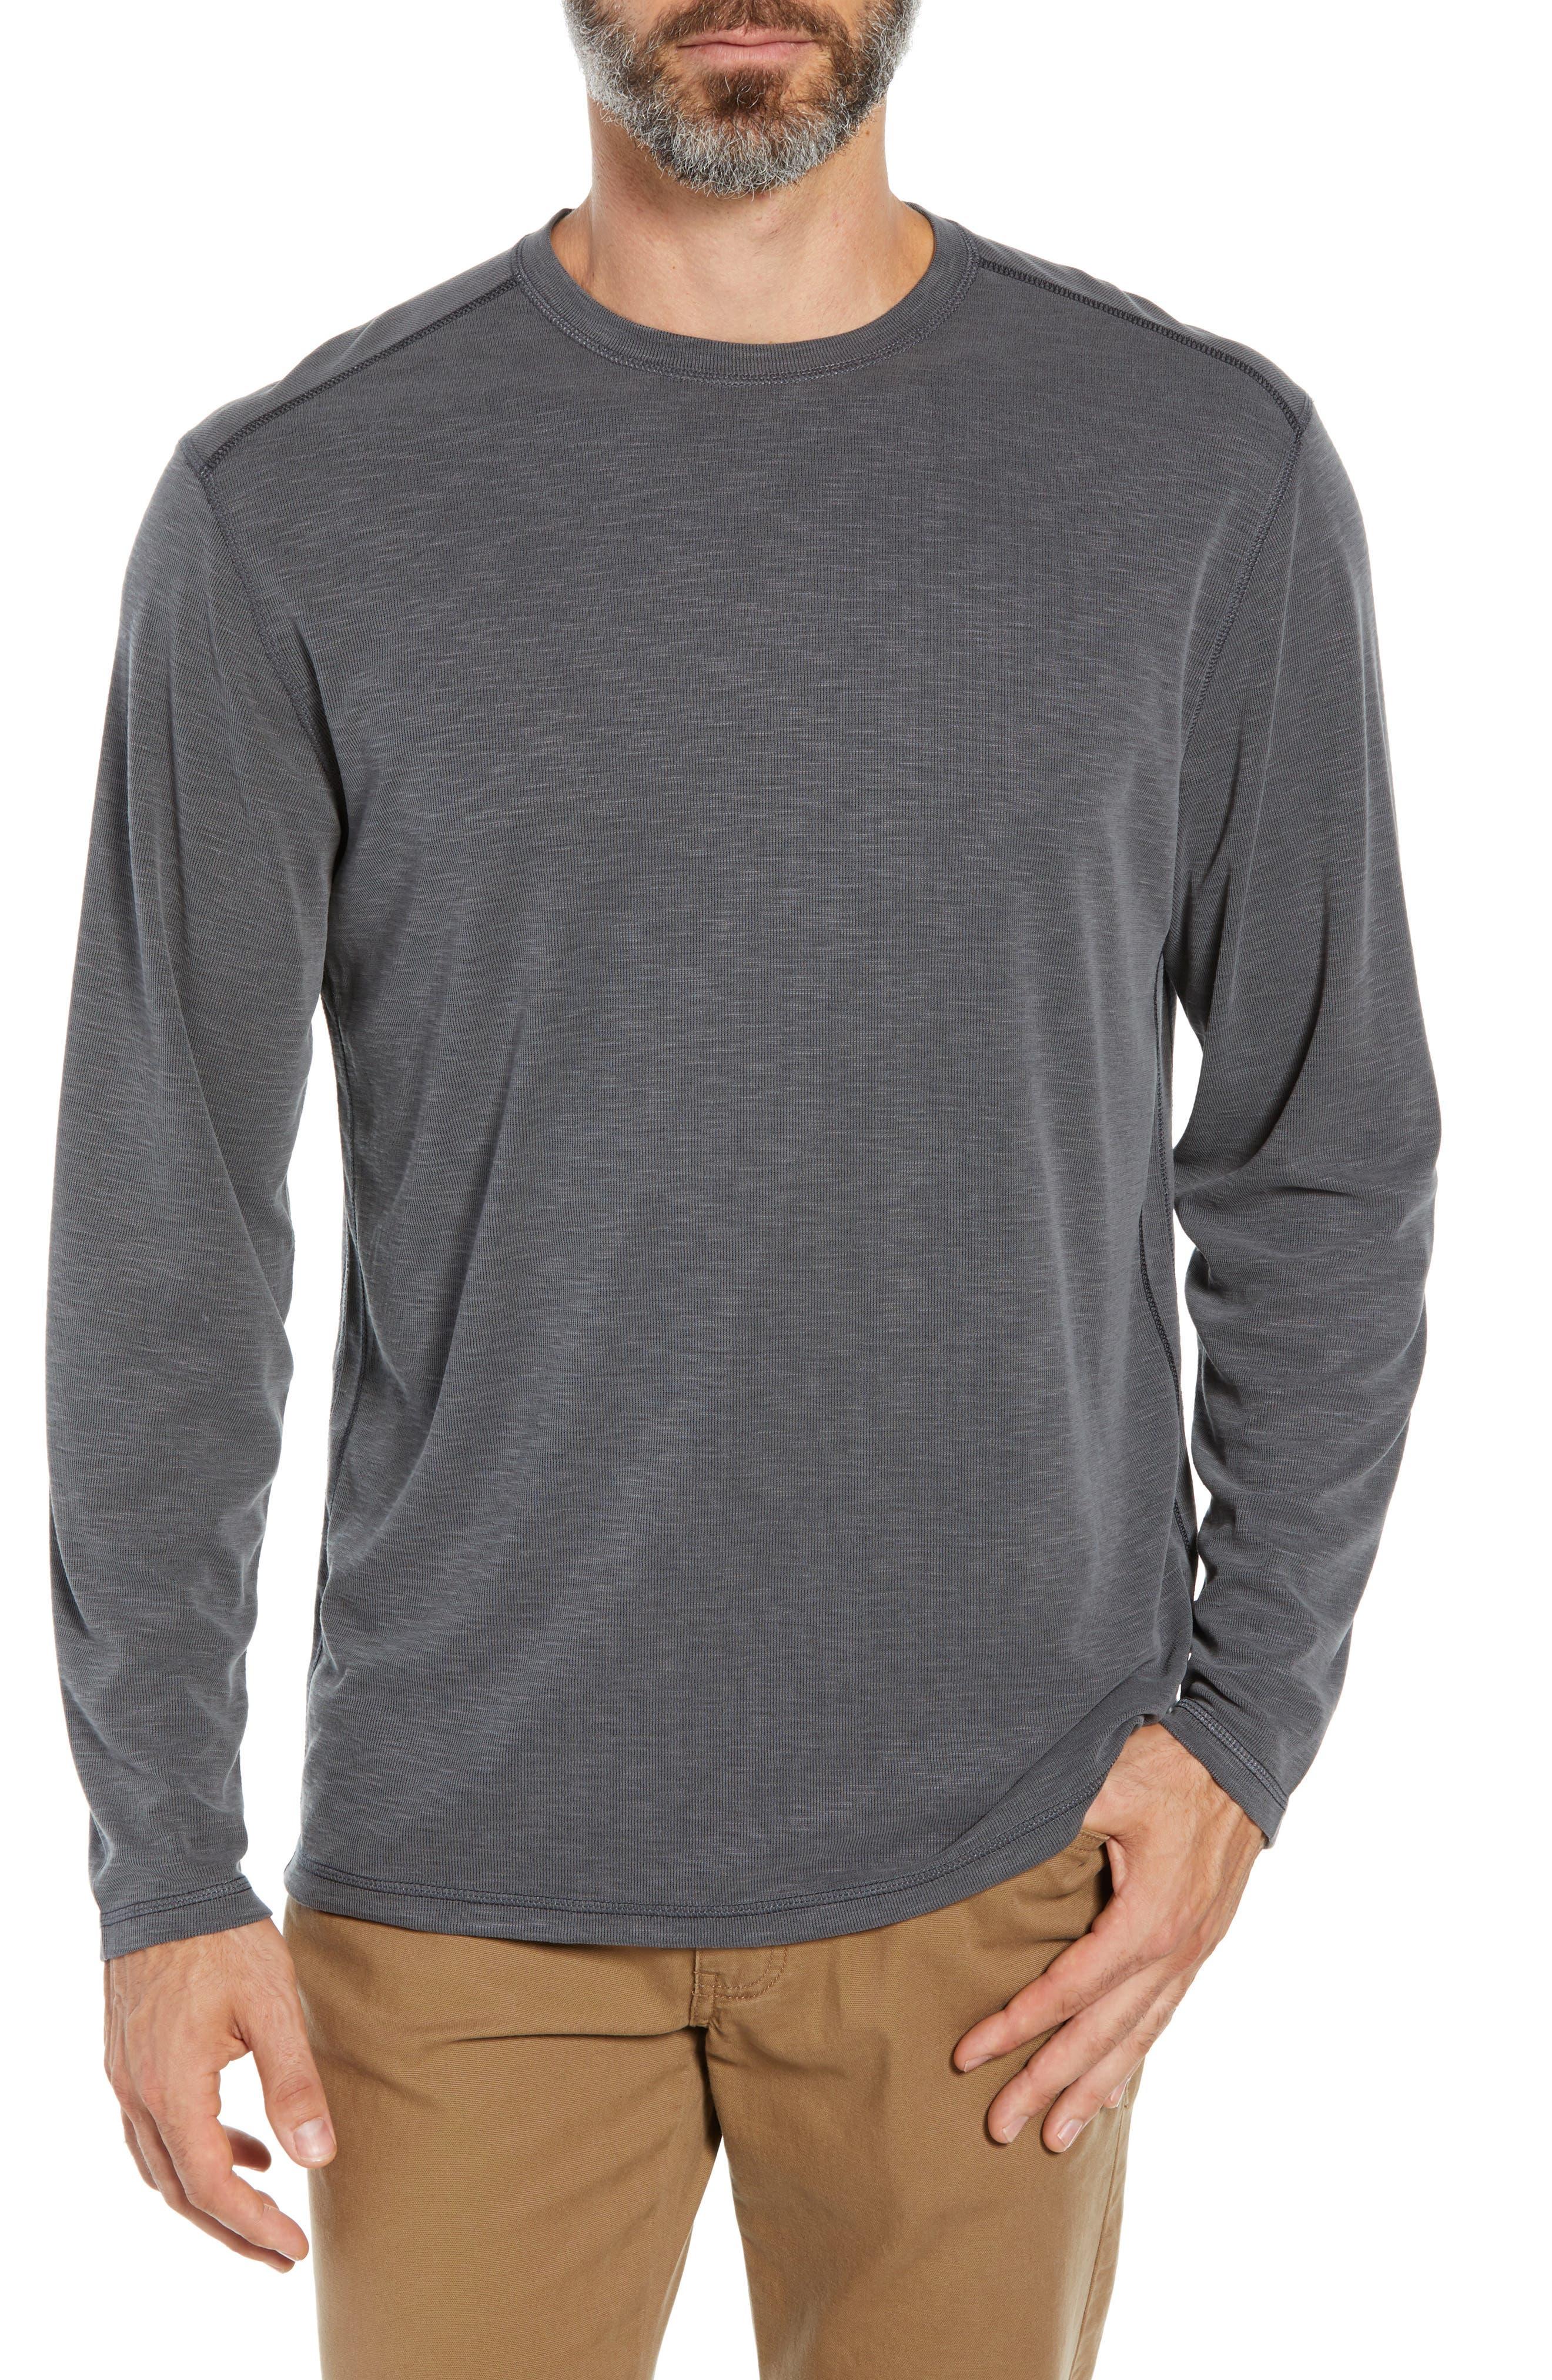 TOMMY BAHAMA Flip Tide T-shirt, Main, color, BLACK